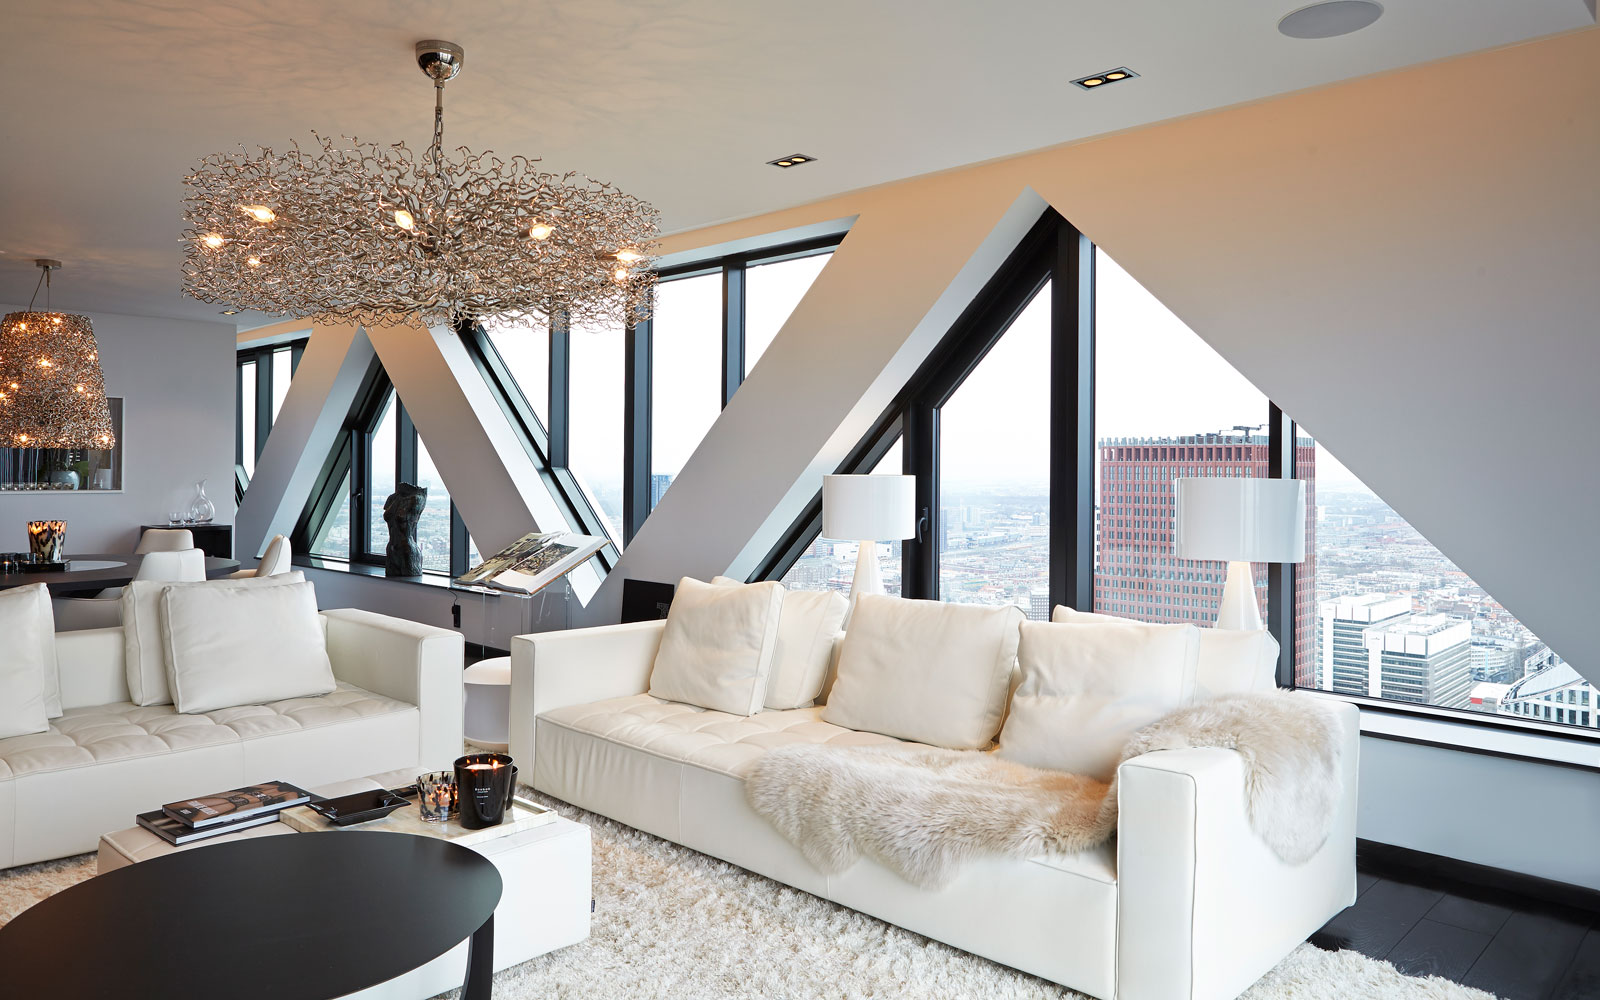 The Art of Living, Exclusief wonen, Penthouse Roelfien Vos, interieurdesign, uitzicht, vloerkleed, modern interieur, interieurinspiratie, designverlichting, moderne bank, zwarte kozijnen